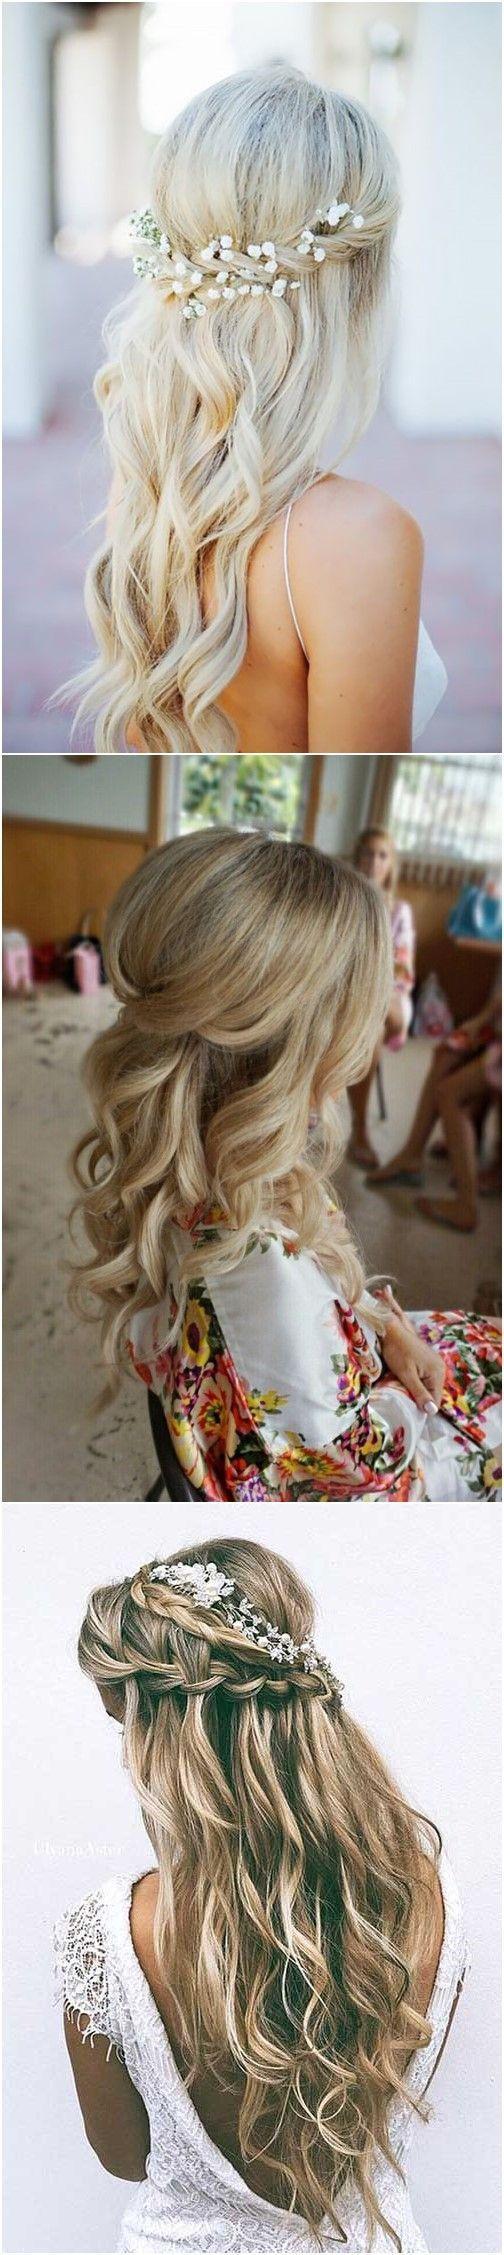 20 Half Up Half Down Wedding Hairstyles Anyone Would Love